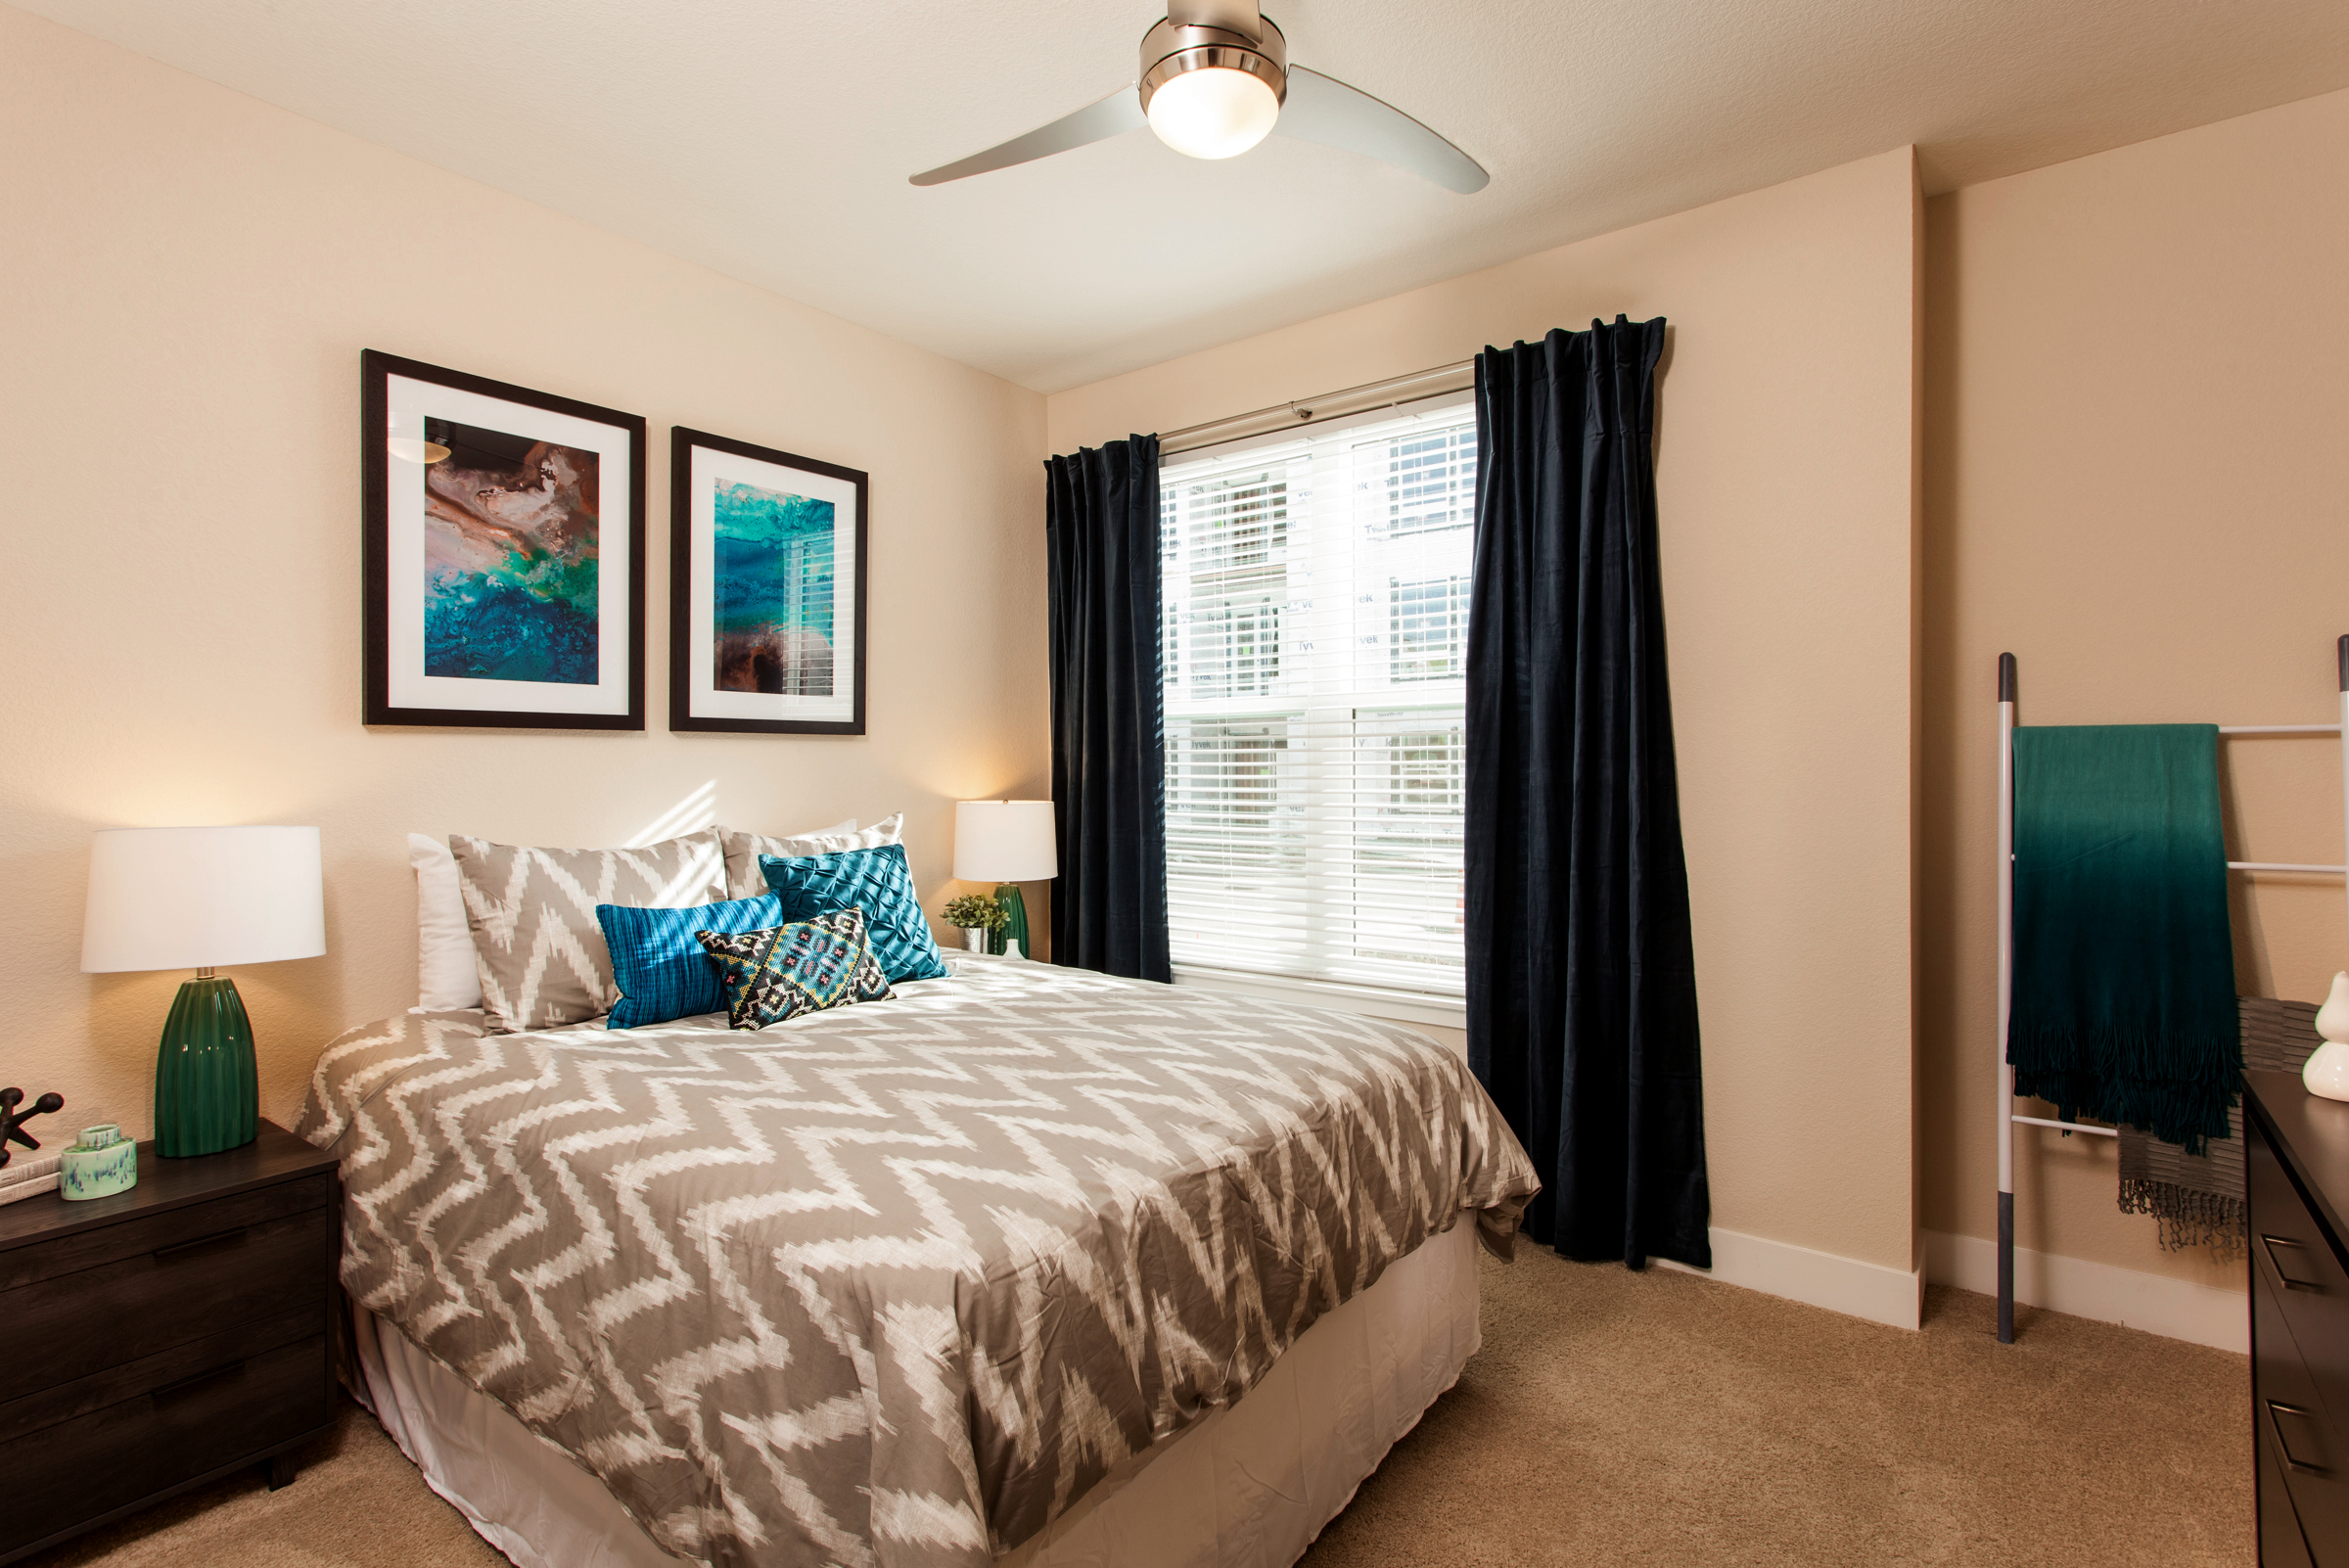 07-Cozy Bedrooms with Walk-In Closets.jpg